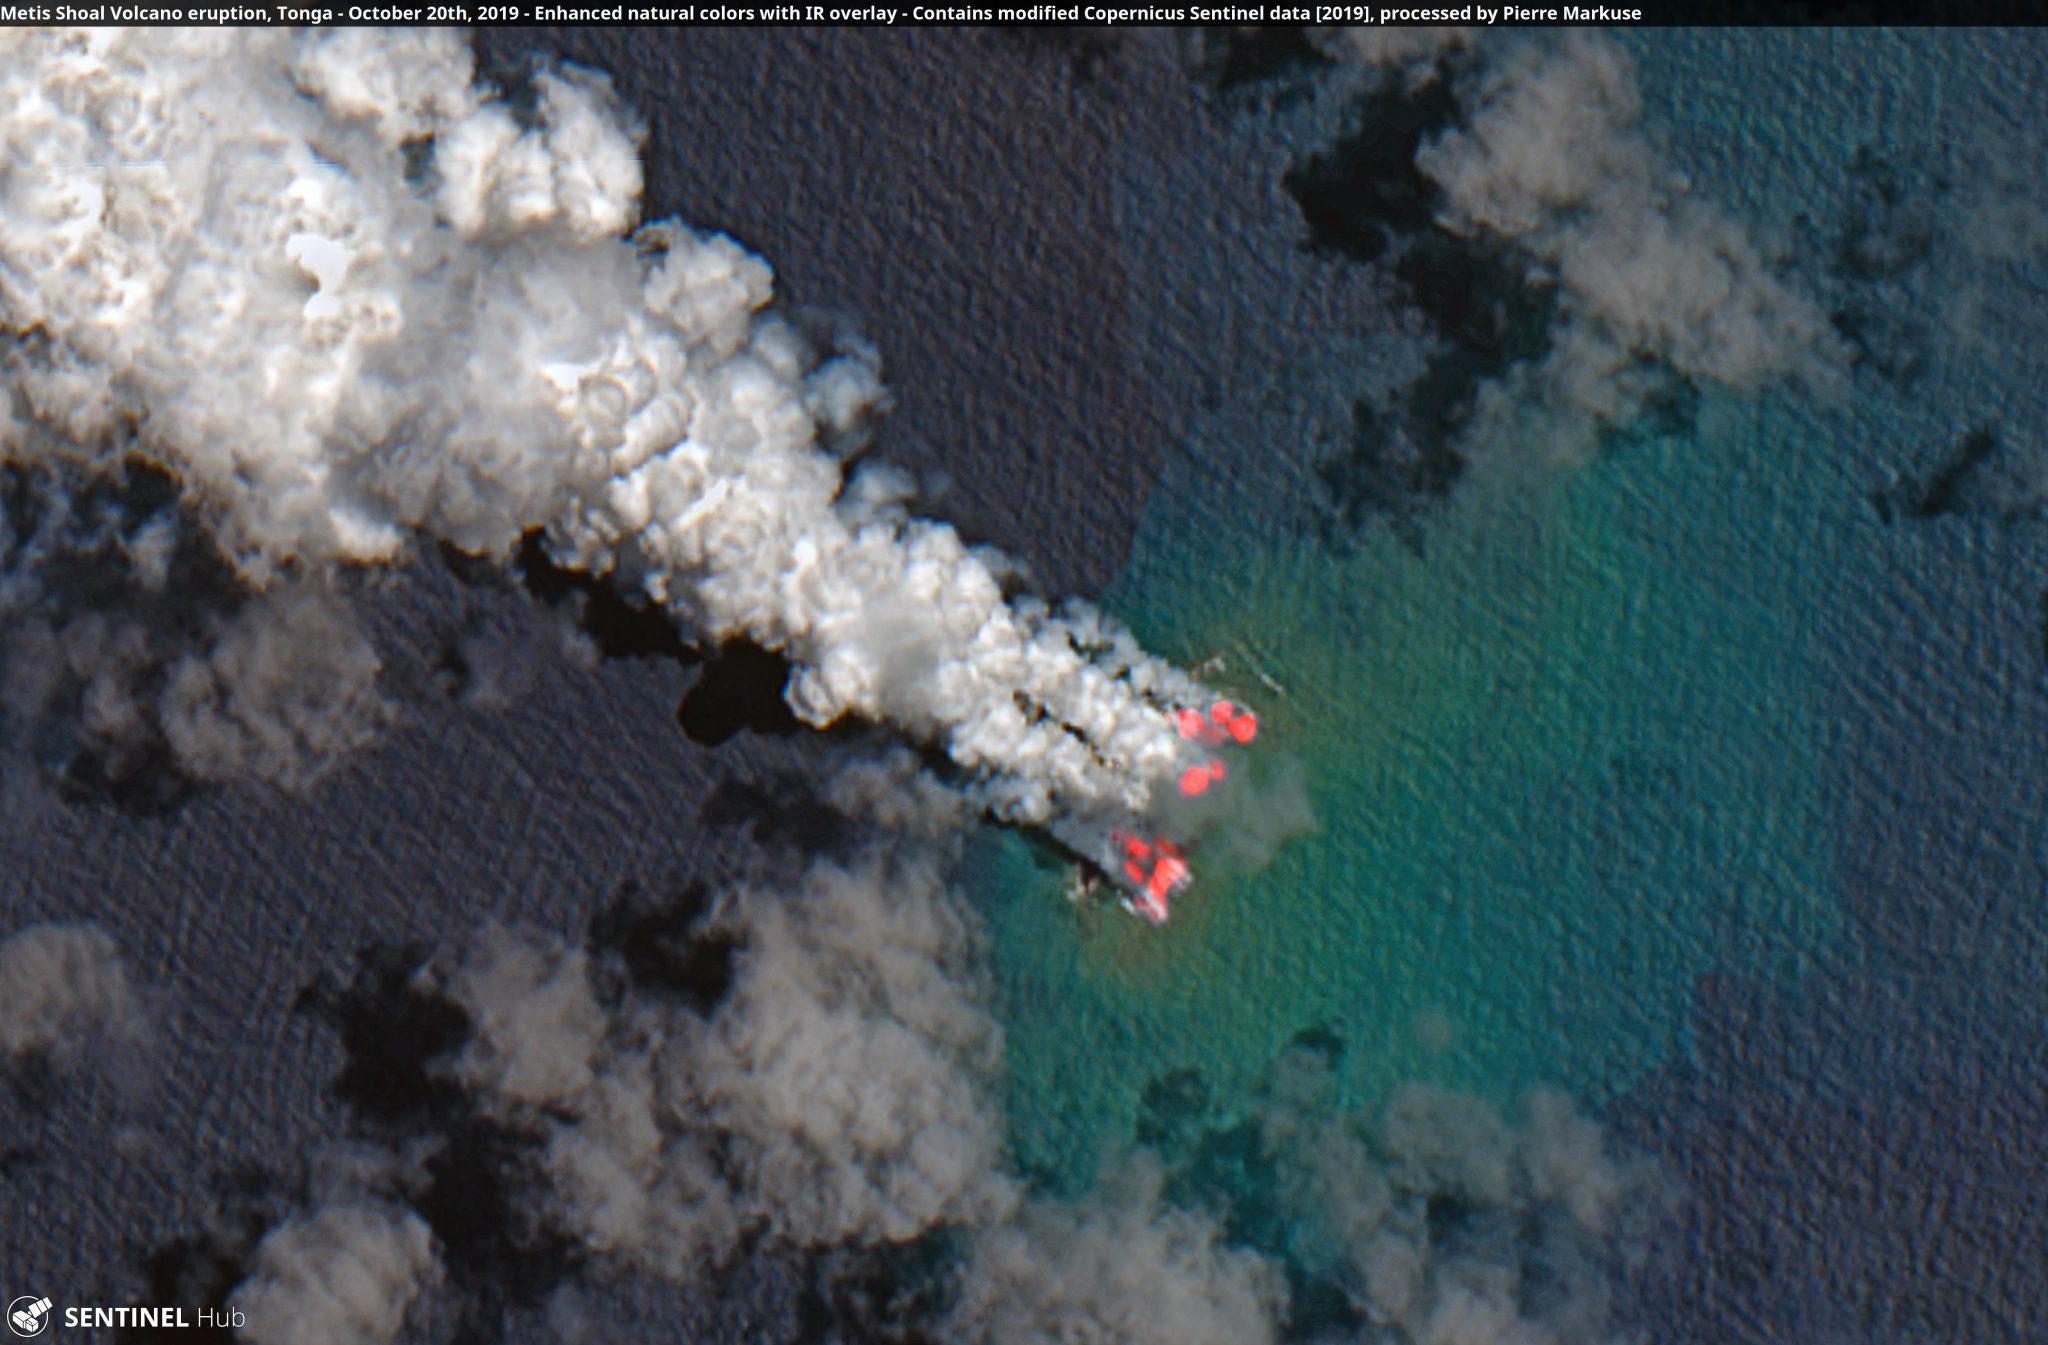 desc:Metis Shoal Volcano eruption, Tonga, with added IR overlay - October 20th, 2019 Copernicus/Pierre Markuse